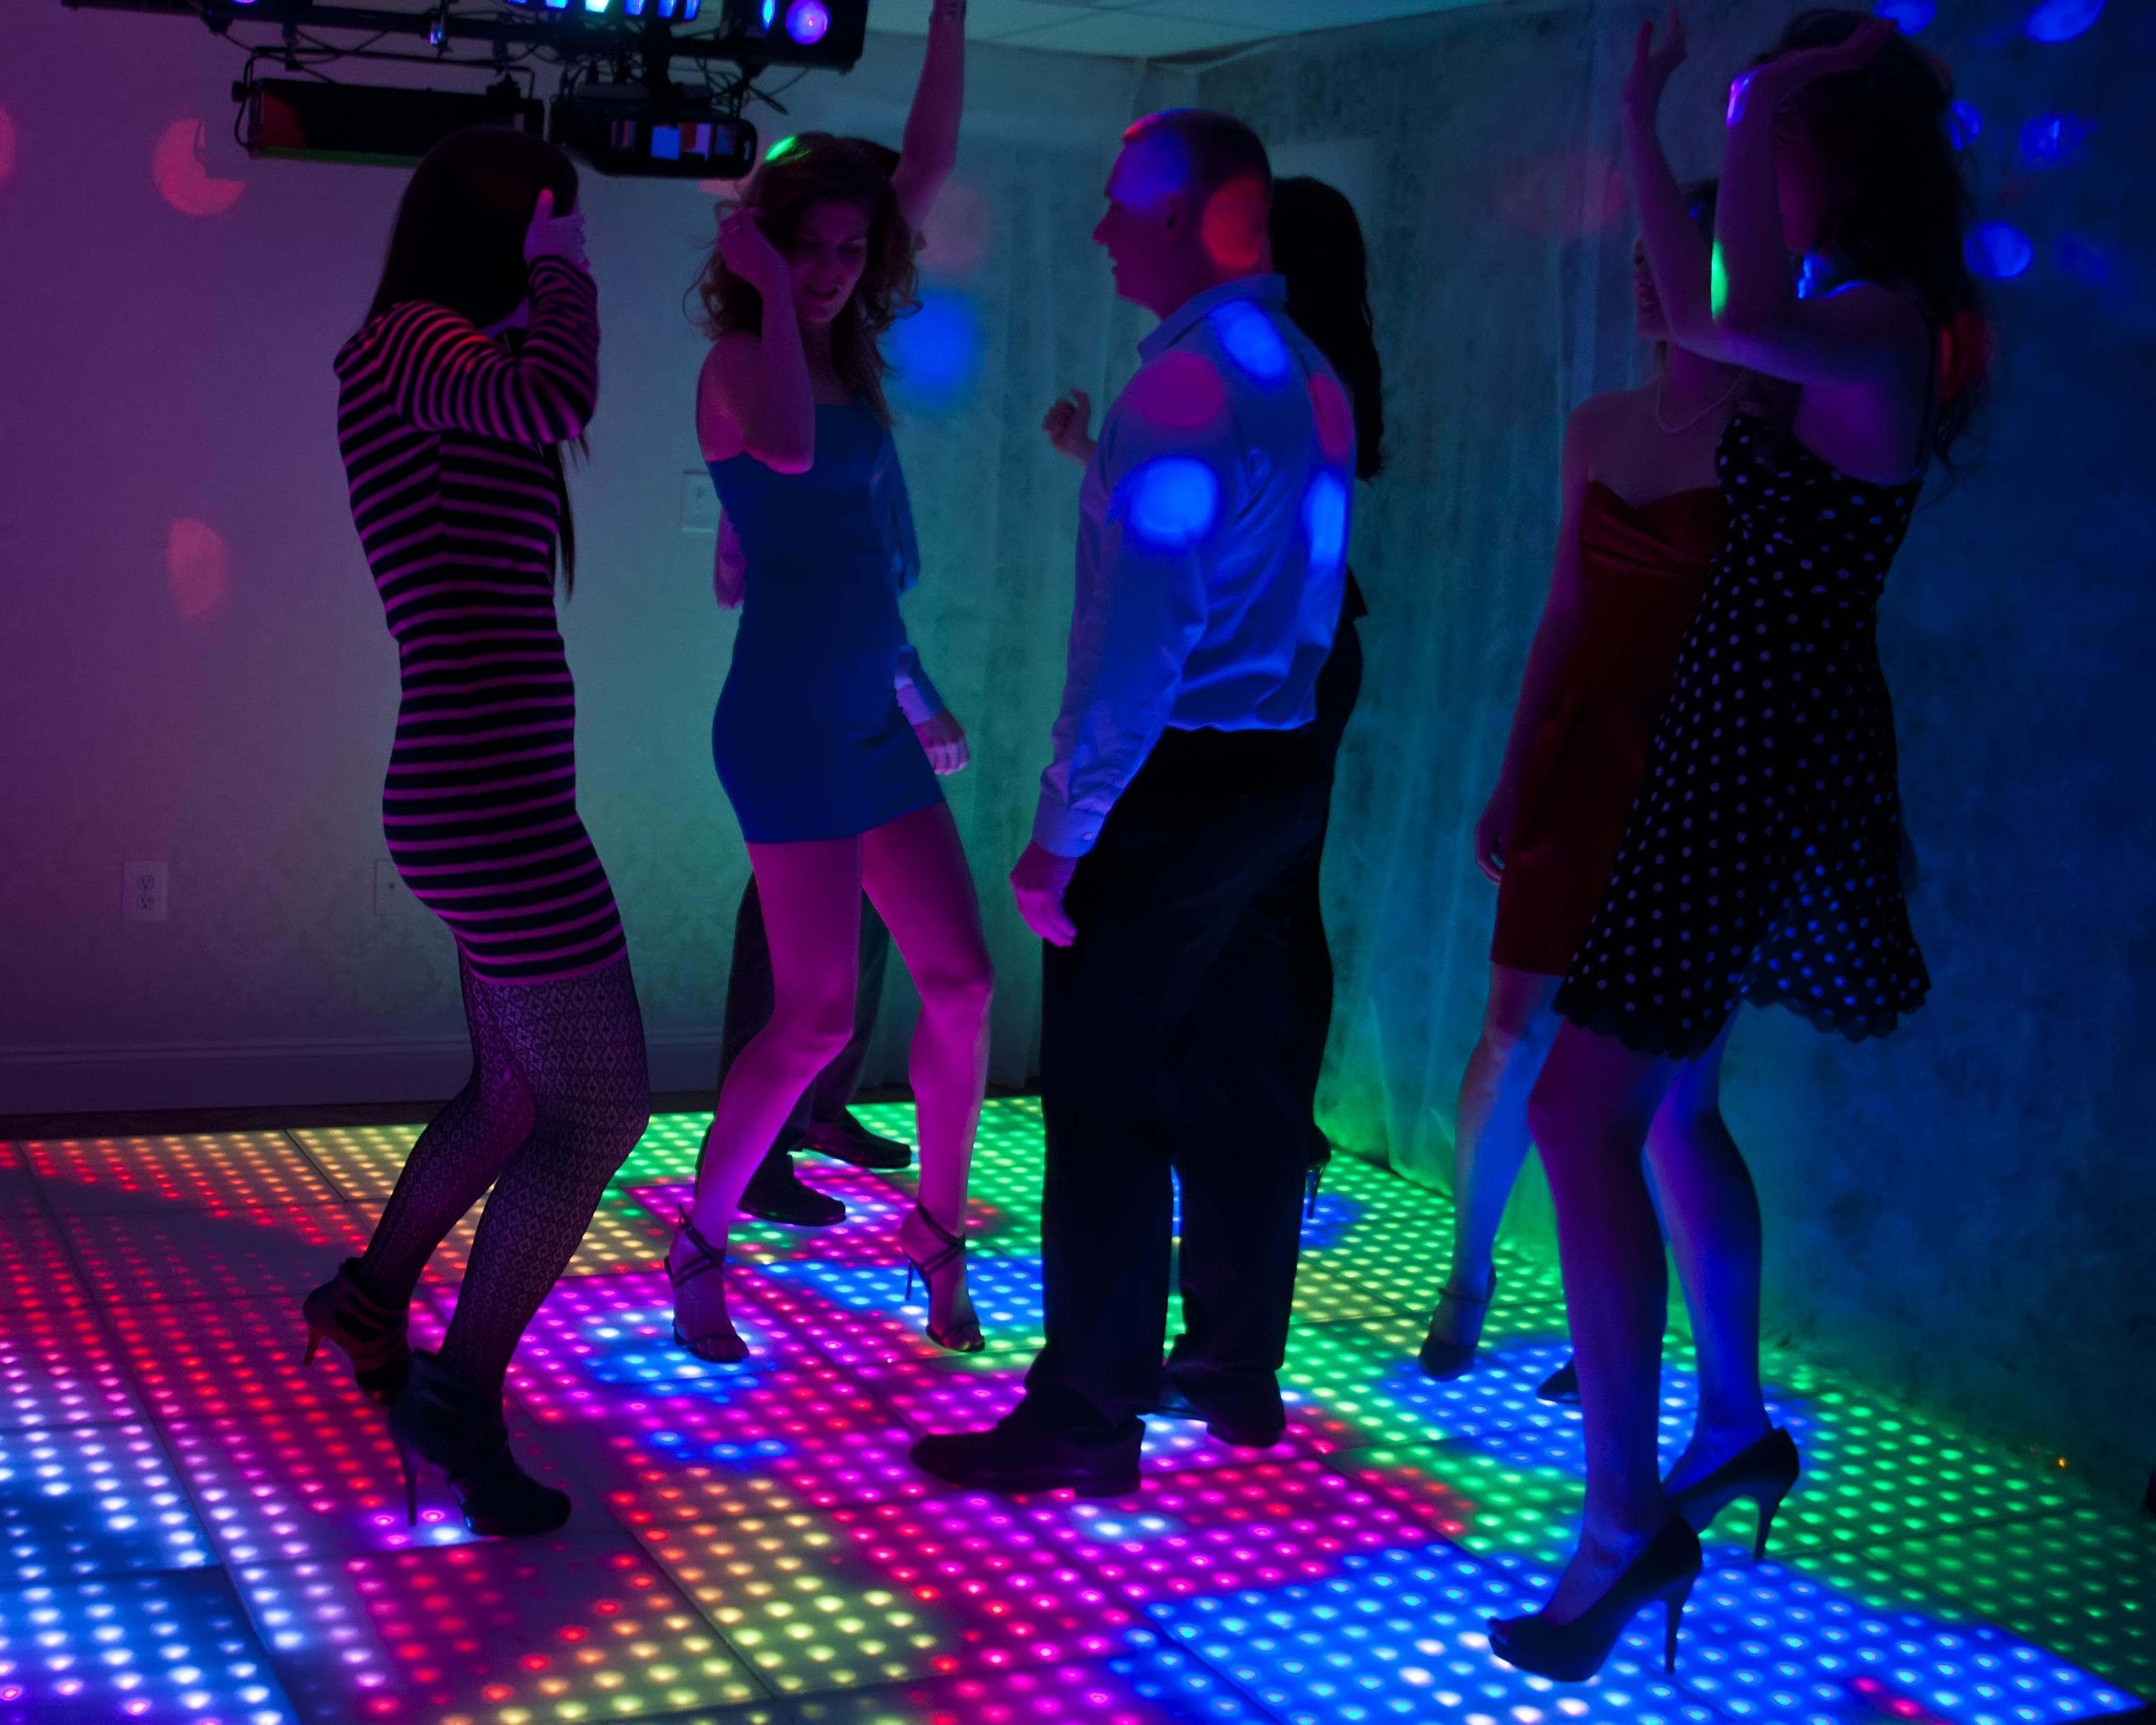 Led Interactive Digital Dance Floor For Parties Trade